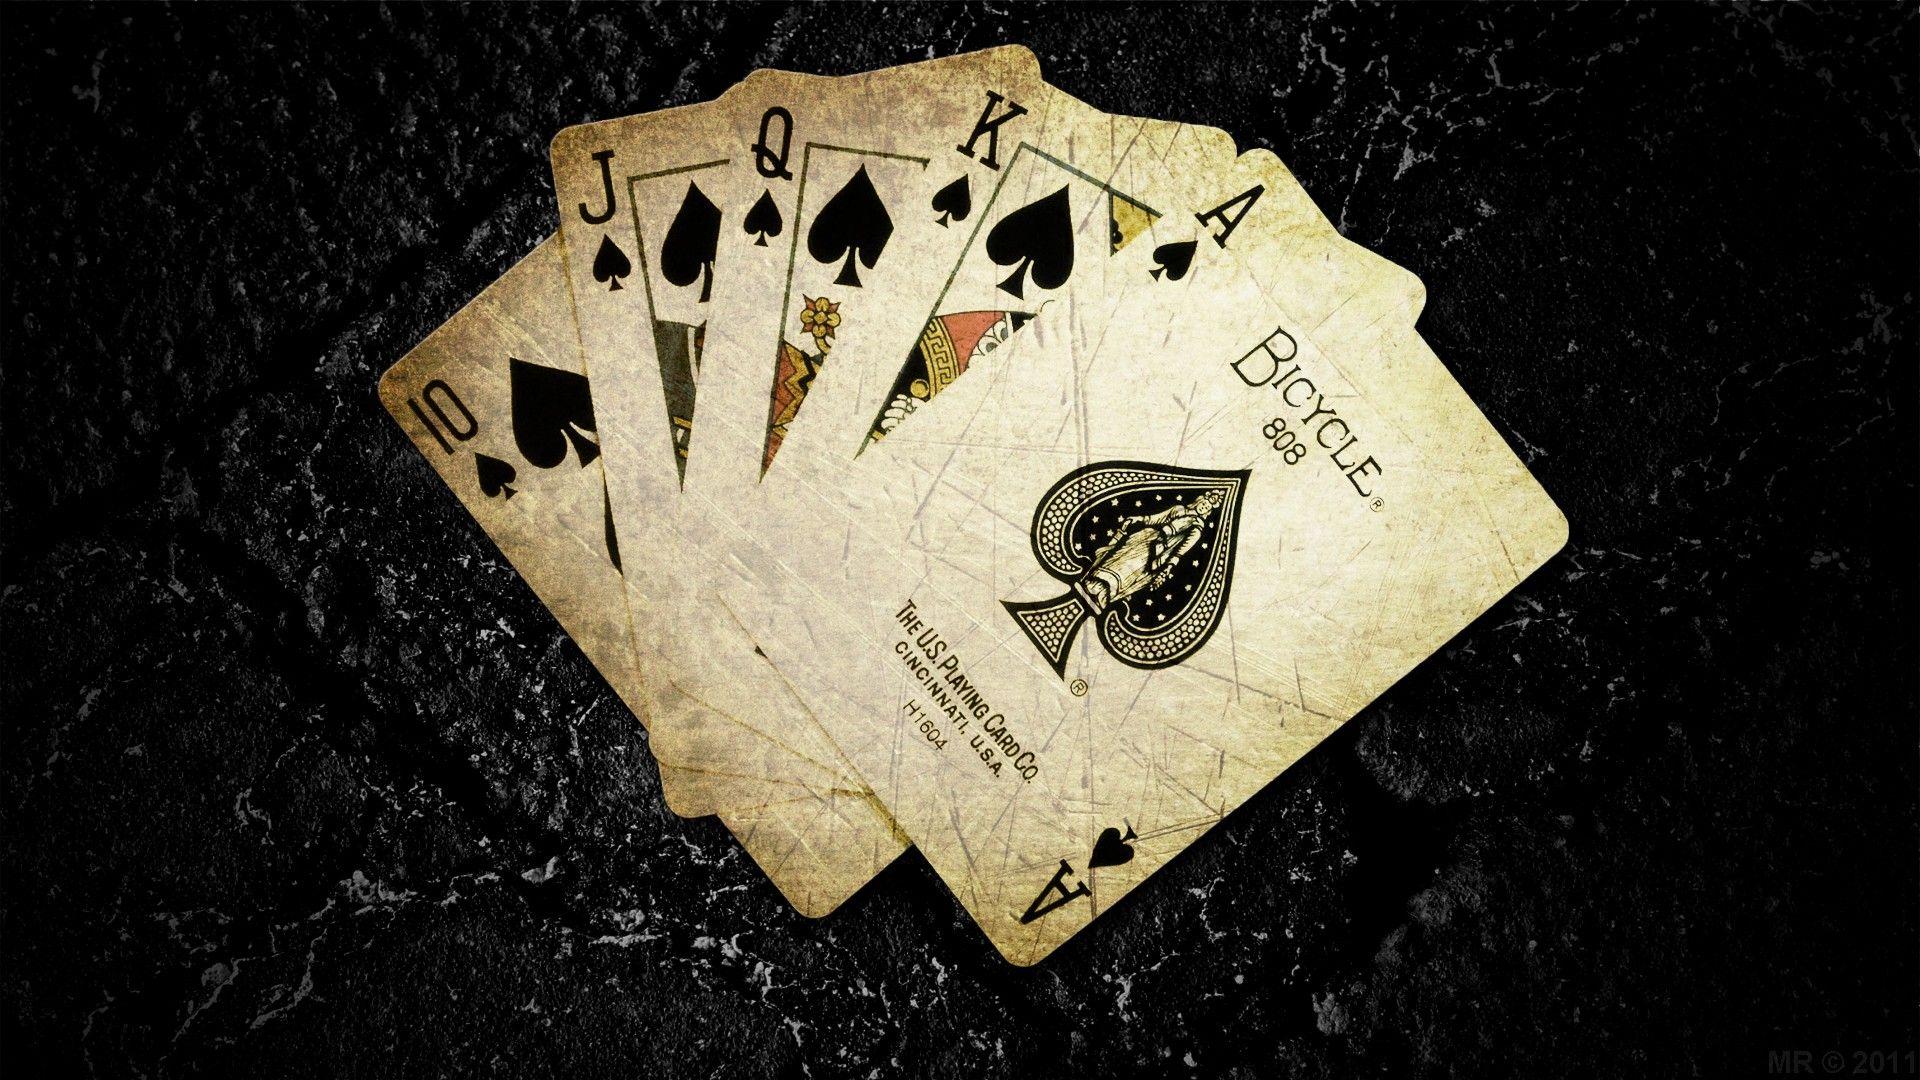 Card Game Dark 1920x1080 Wallpaper Wallpapers In 2019 Spades